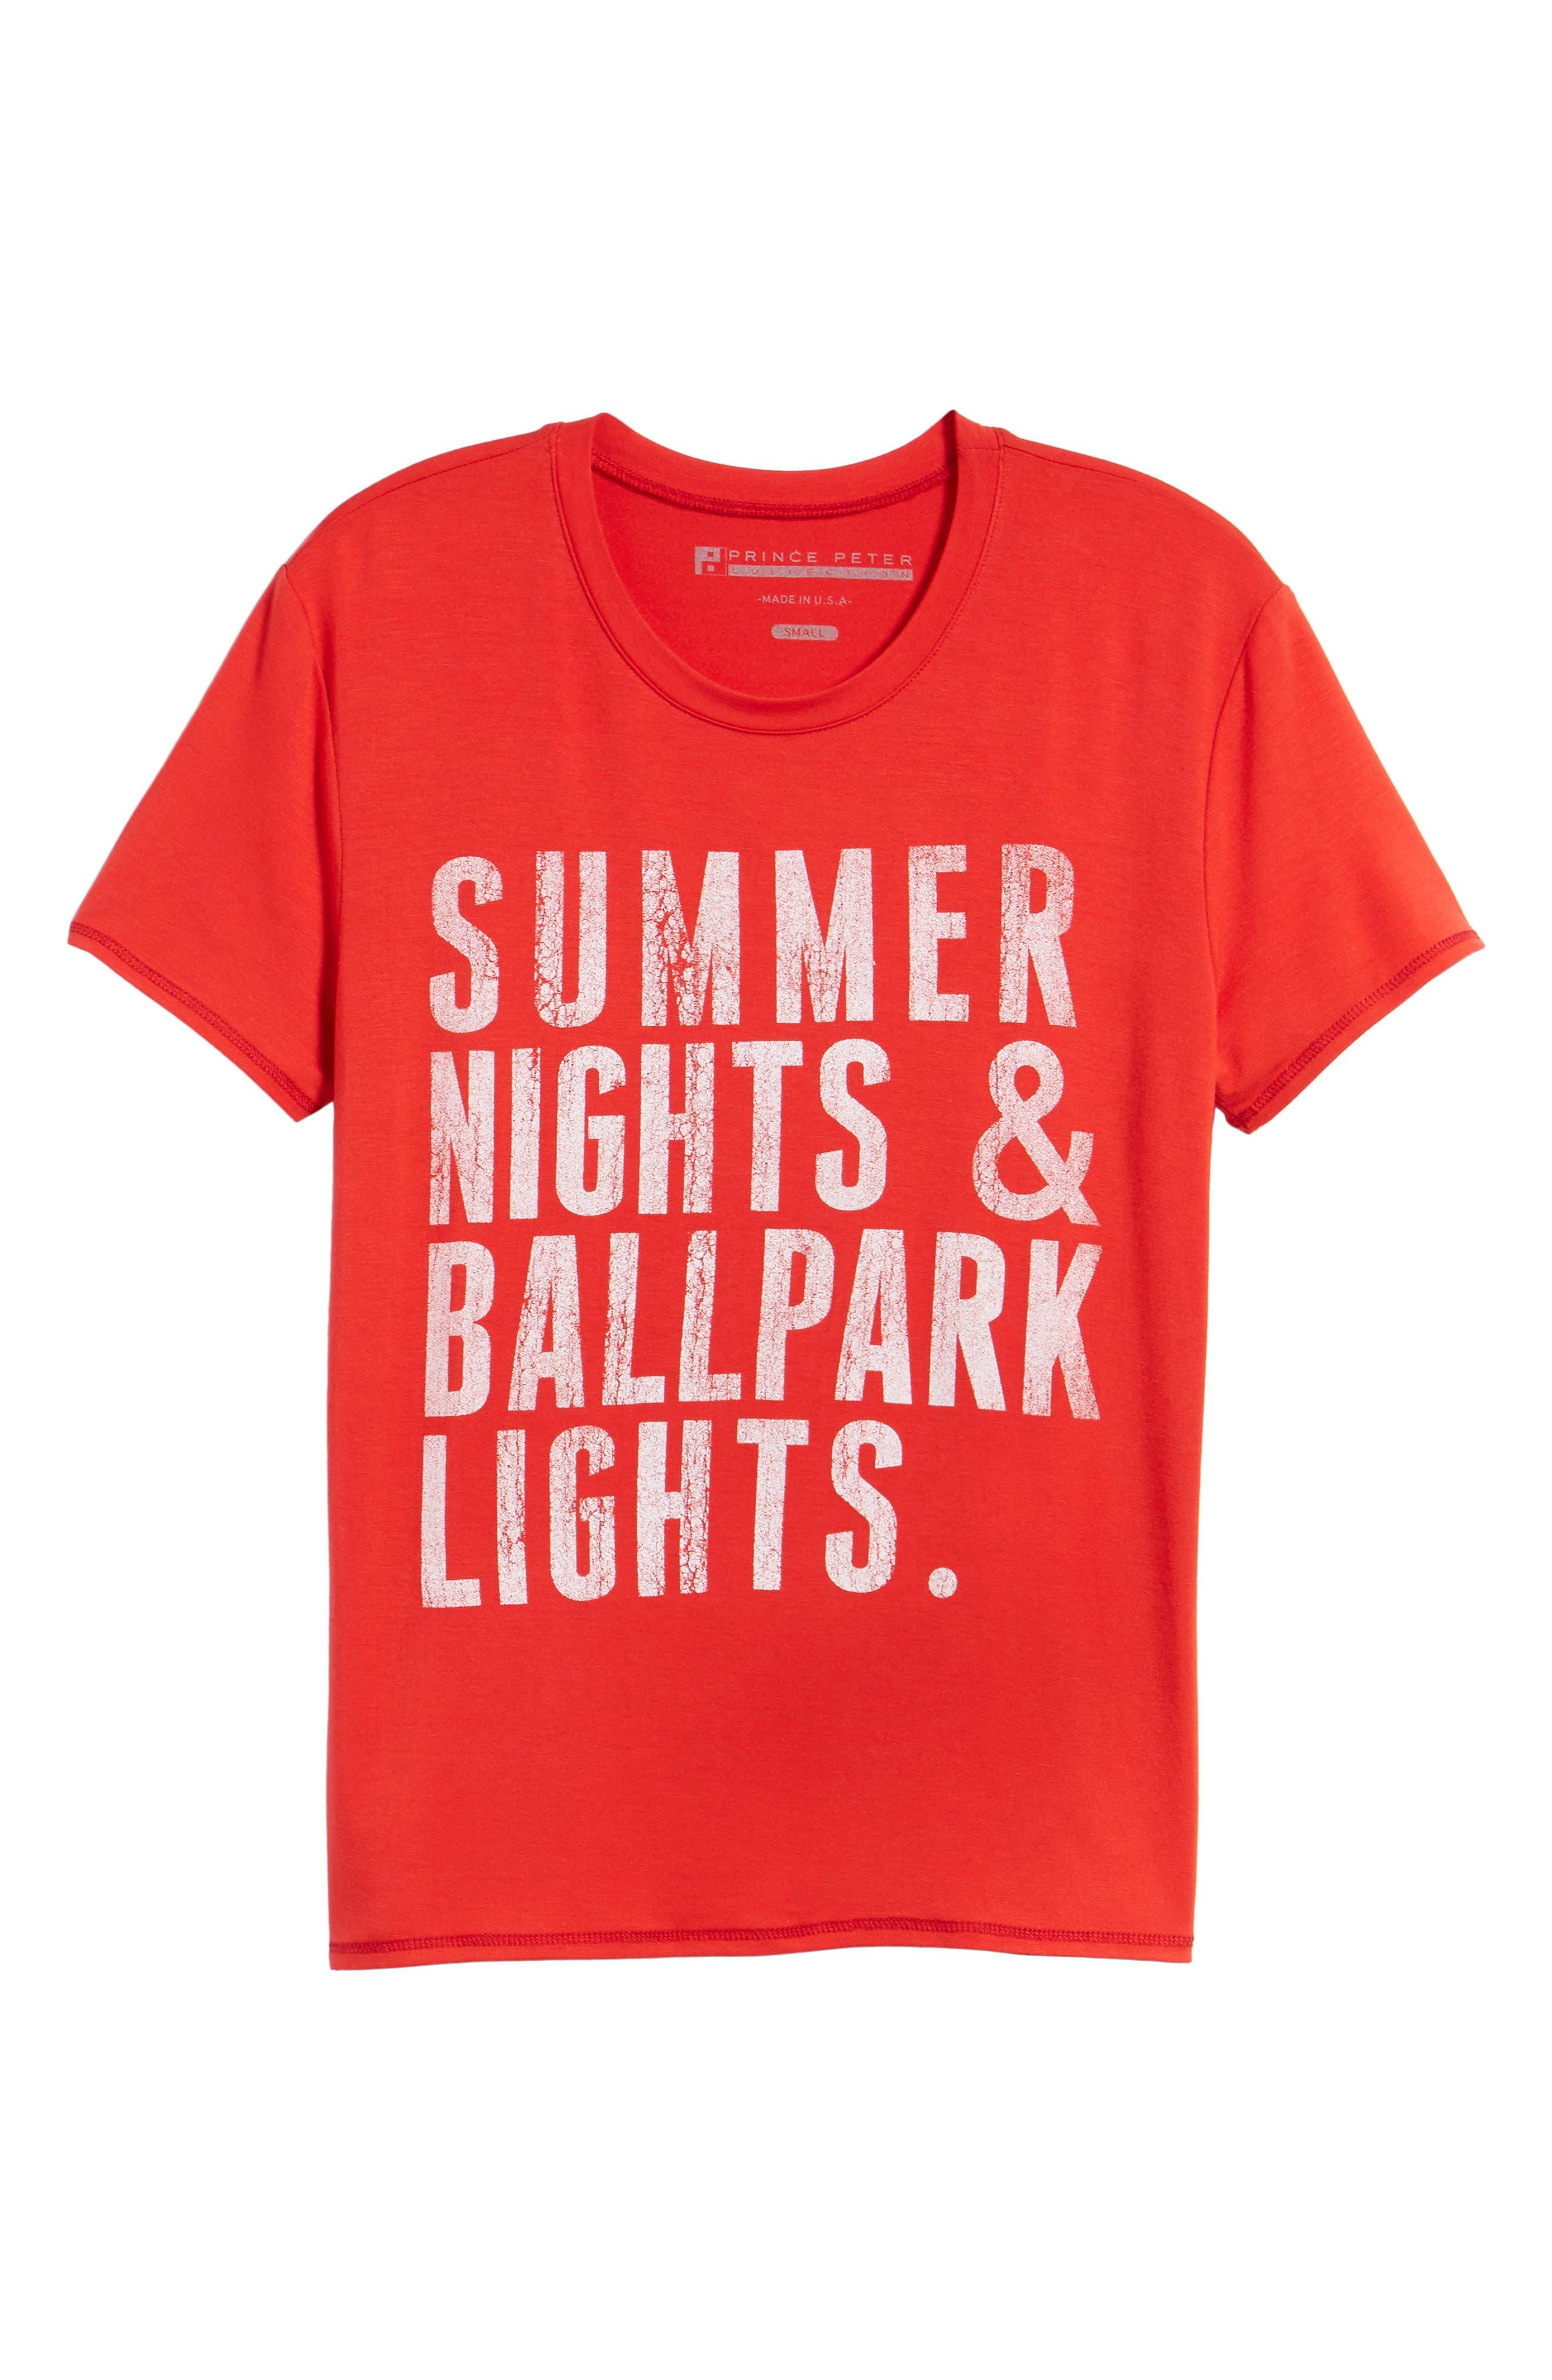 Summer Nights & Ballpark Lights Tee,                             Alternate thumbnail 7, color,                             600